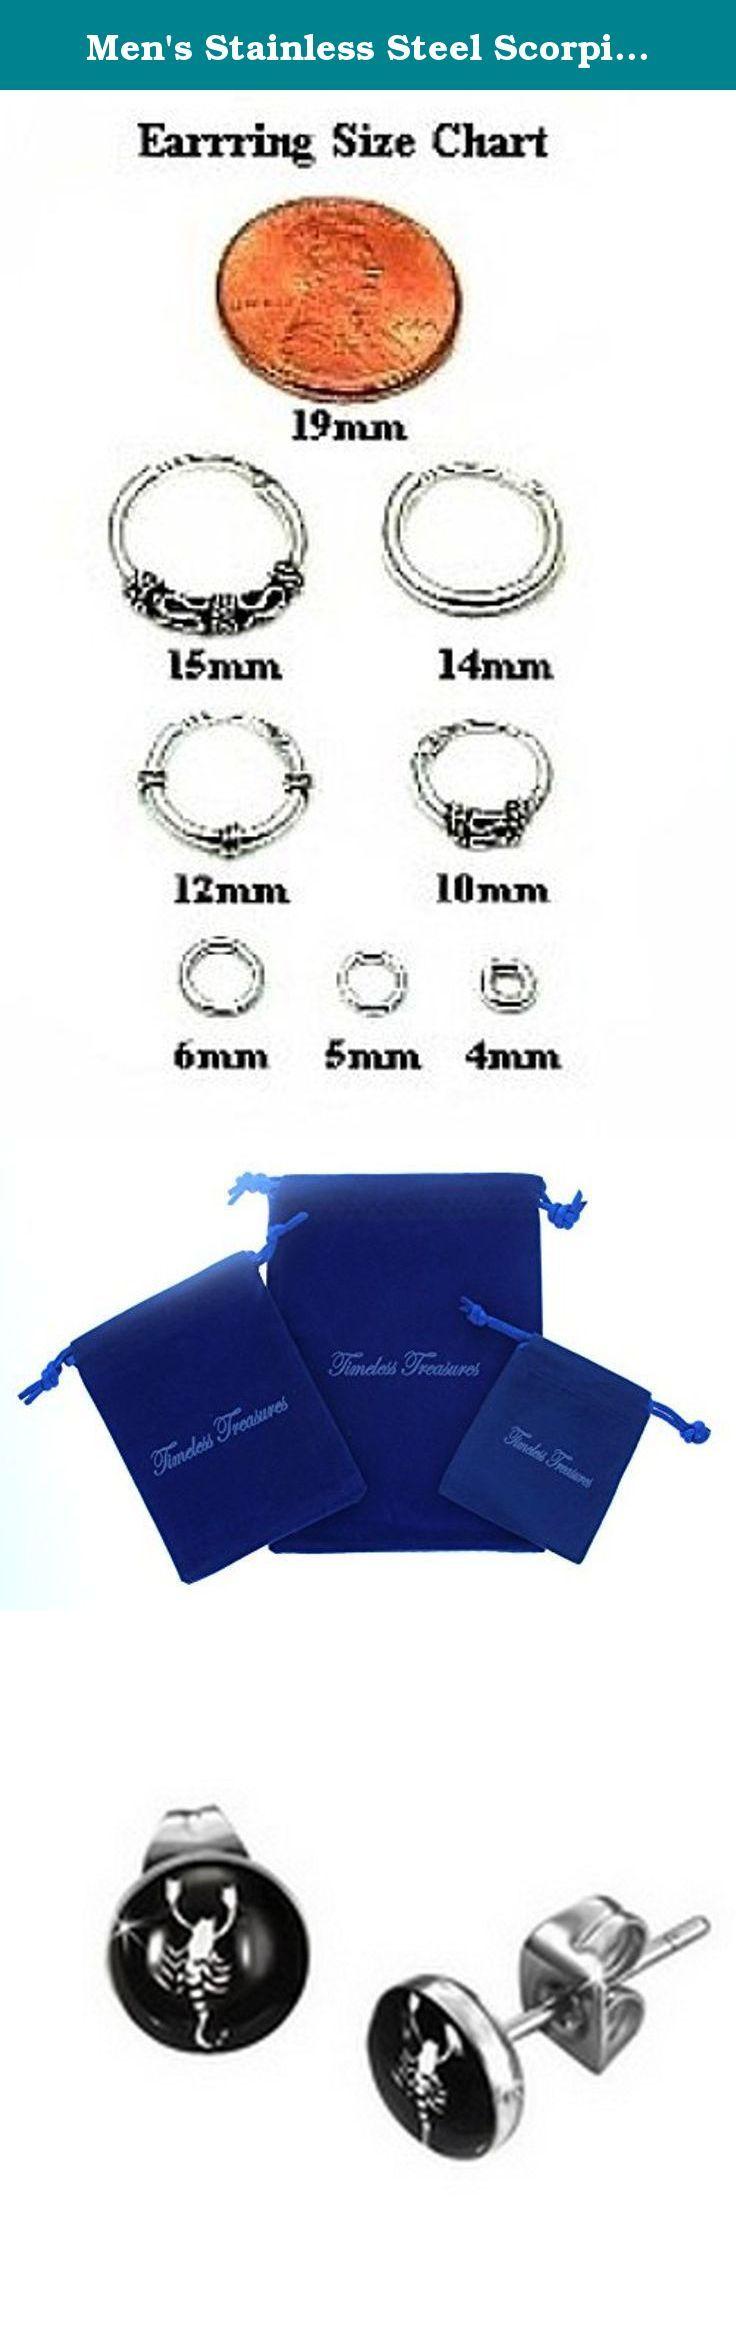 "Men's Stainless Steel Scorpio Zodiac Sign Stud Earrings - 7mm Diameter (.27""). Stainless Steel Scorpio Zodiac Sign Stud Earrings - 7mm Diameter (.27"")."